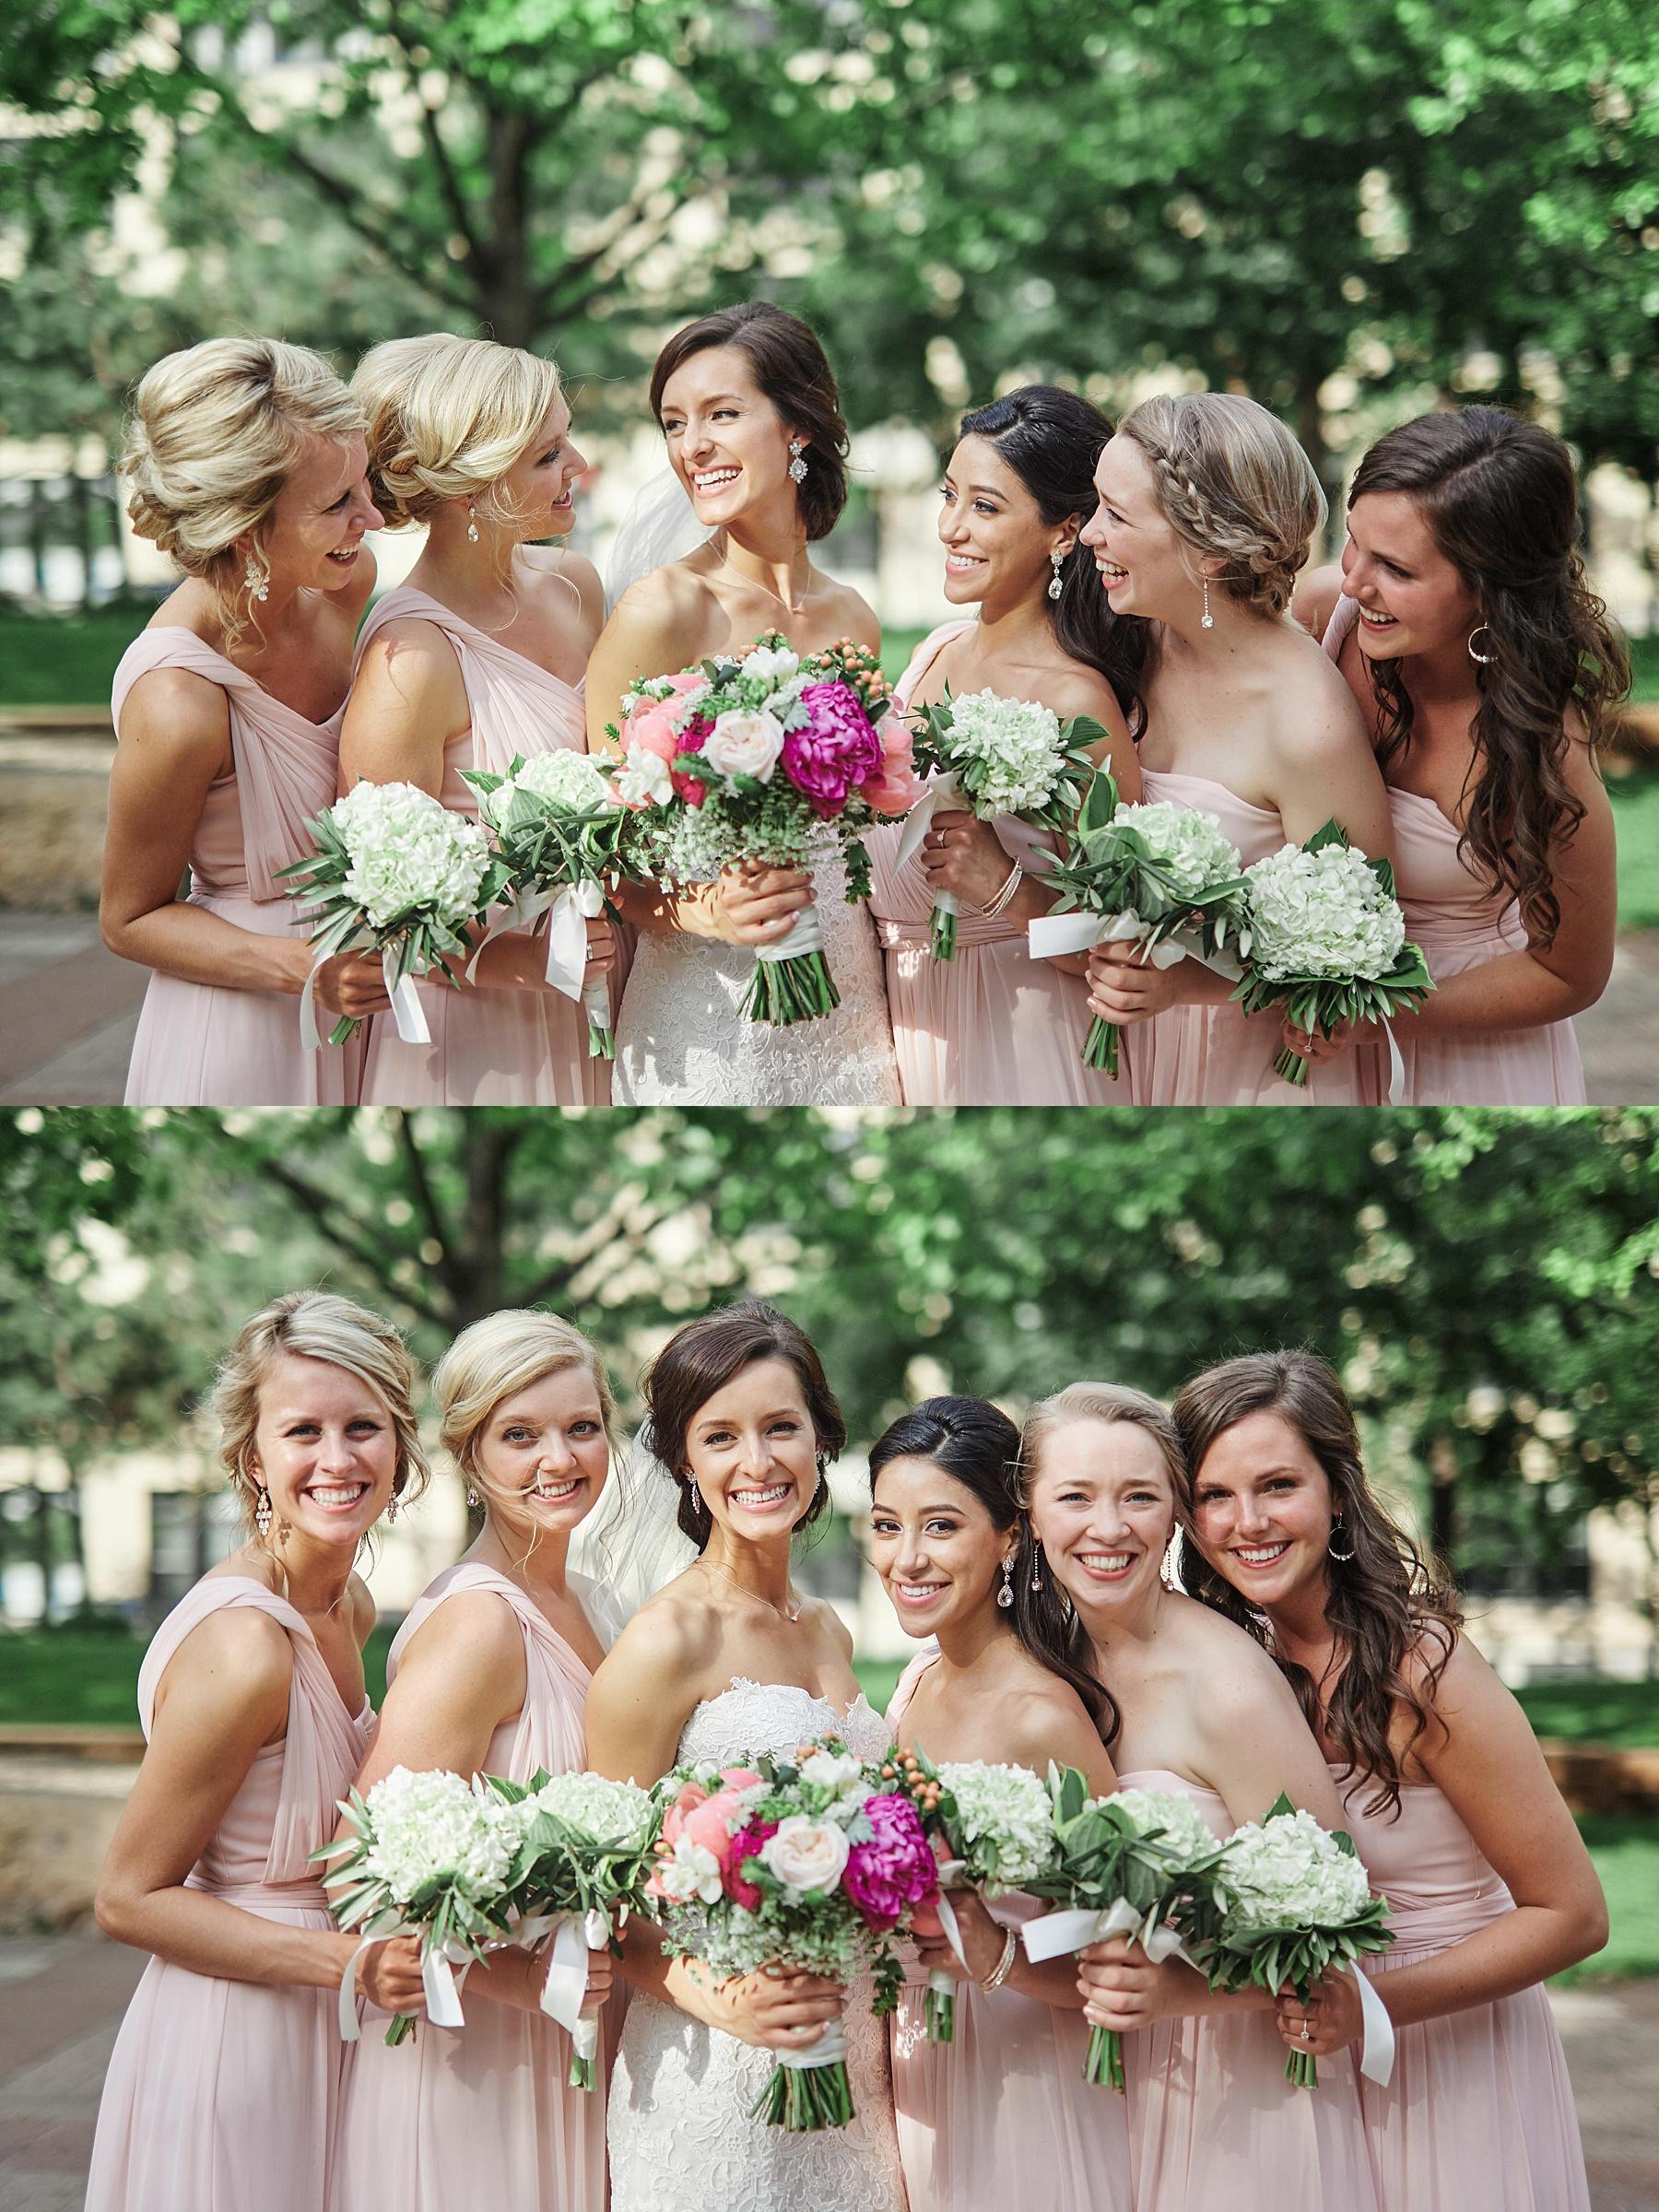 ABULAE-Wedding-Saint-paul-MN-Josh-Sofia-Wedding-Mears-Park_0791.jpg